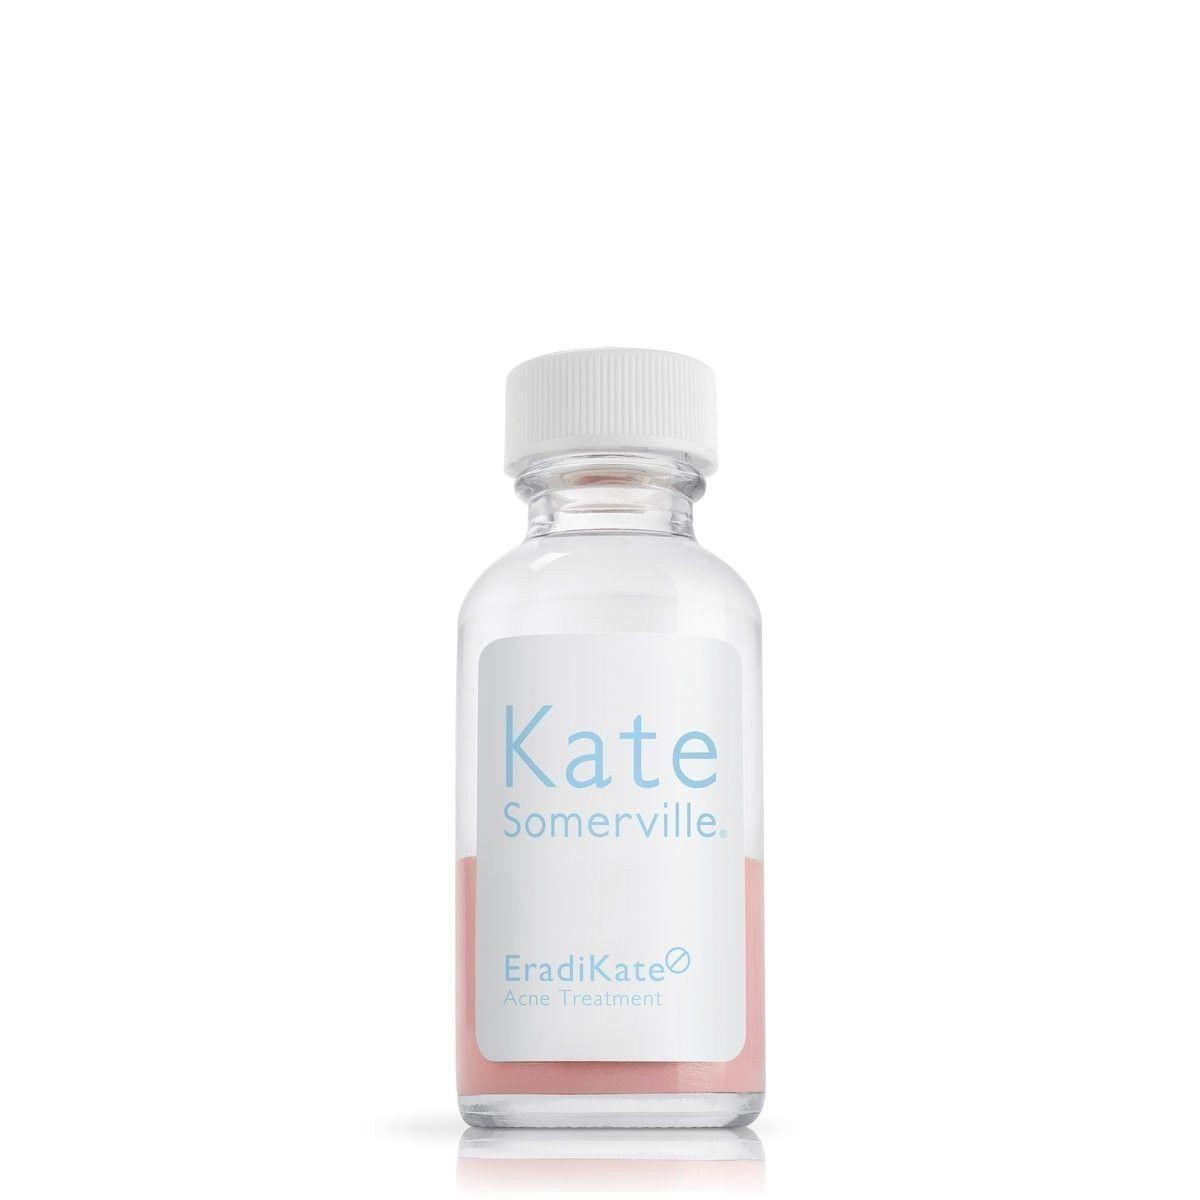 Eradikate try acne treatments kate somerville